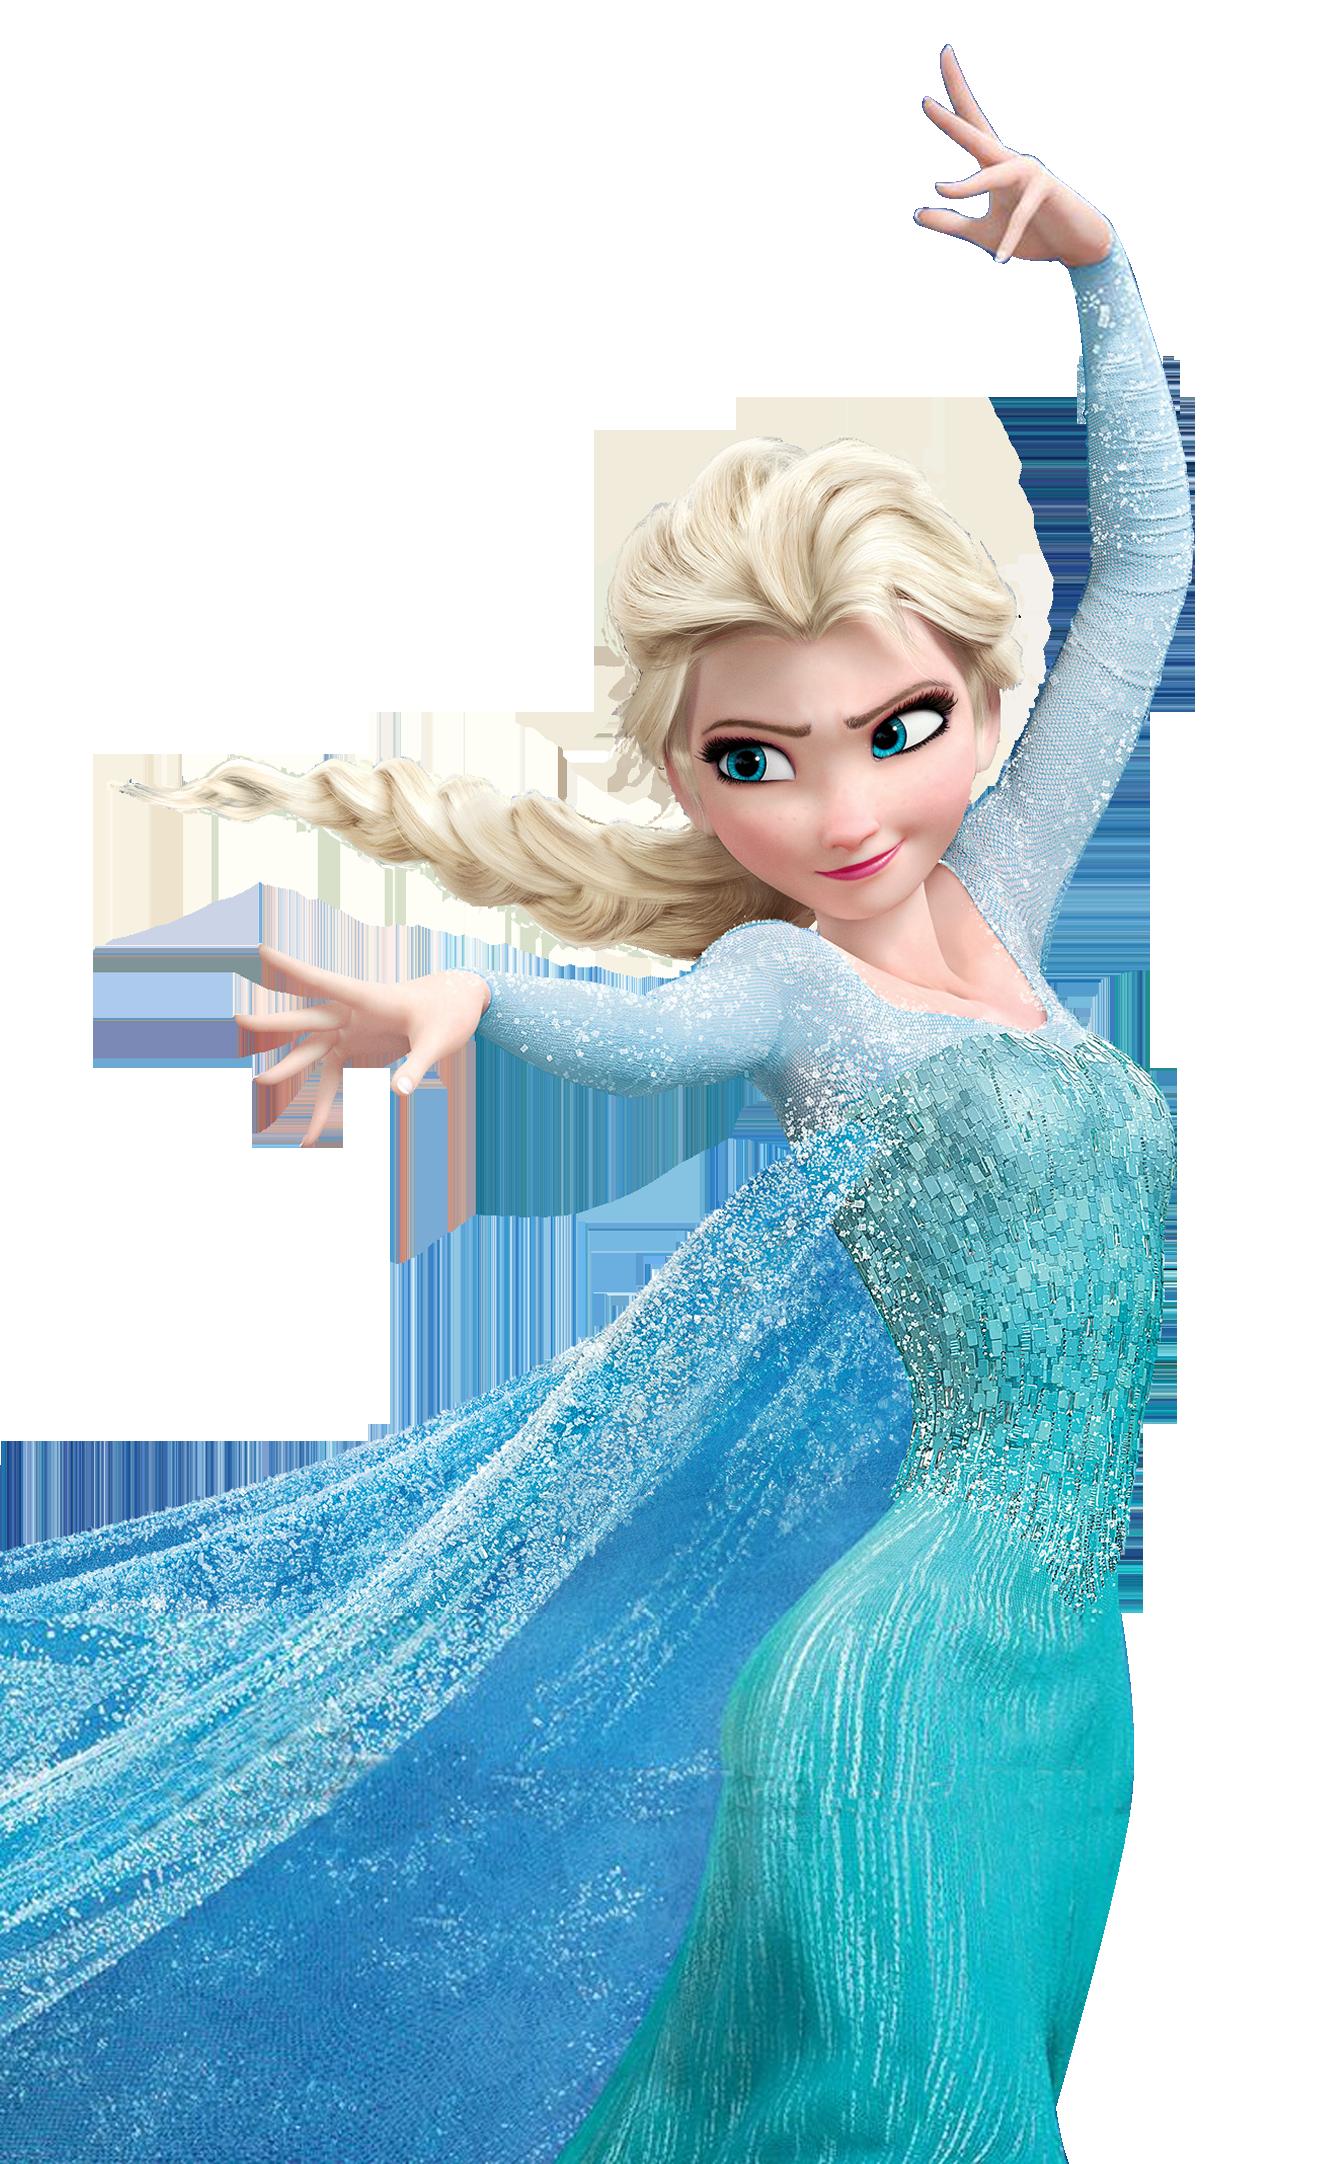 frozen 2 | Frozen pictures, Elsa, Disney frozen